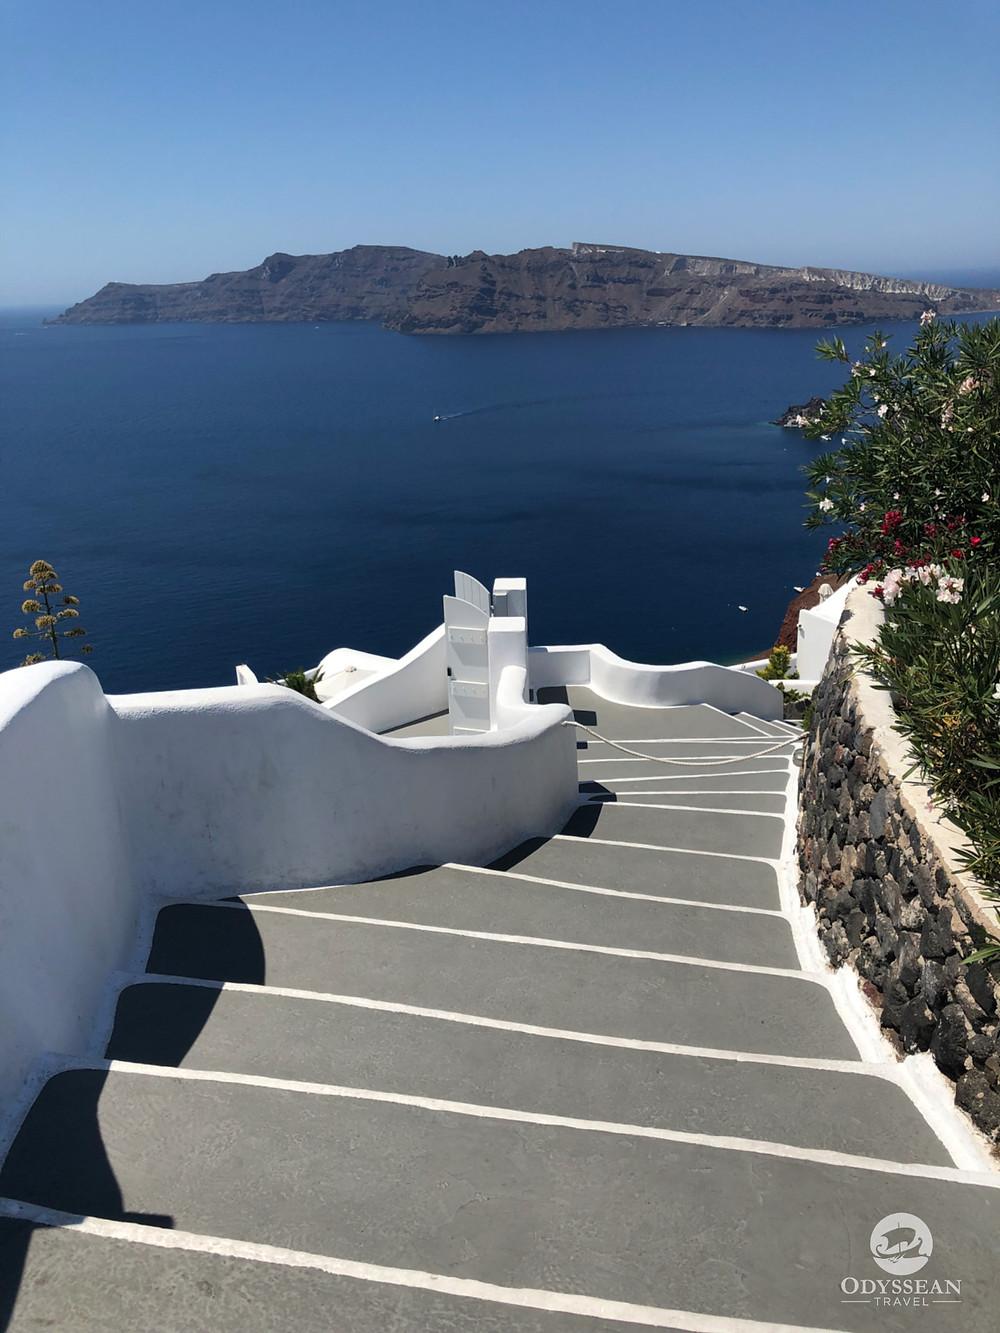 Staircase leading to a luxury villa in Santorini, Greece